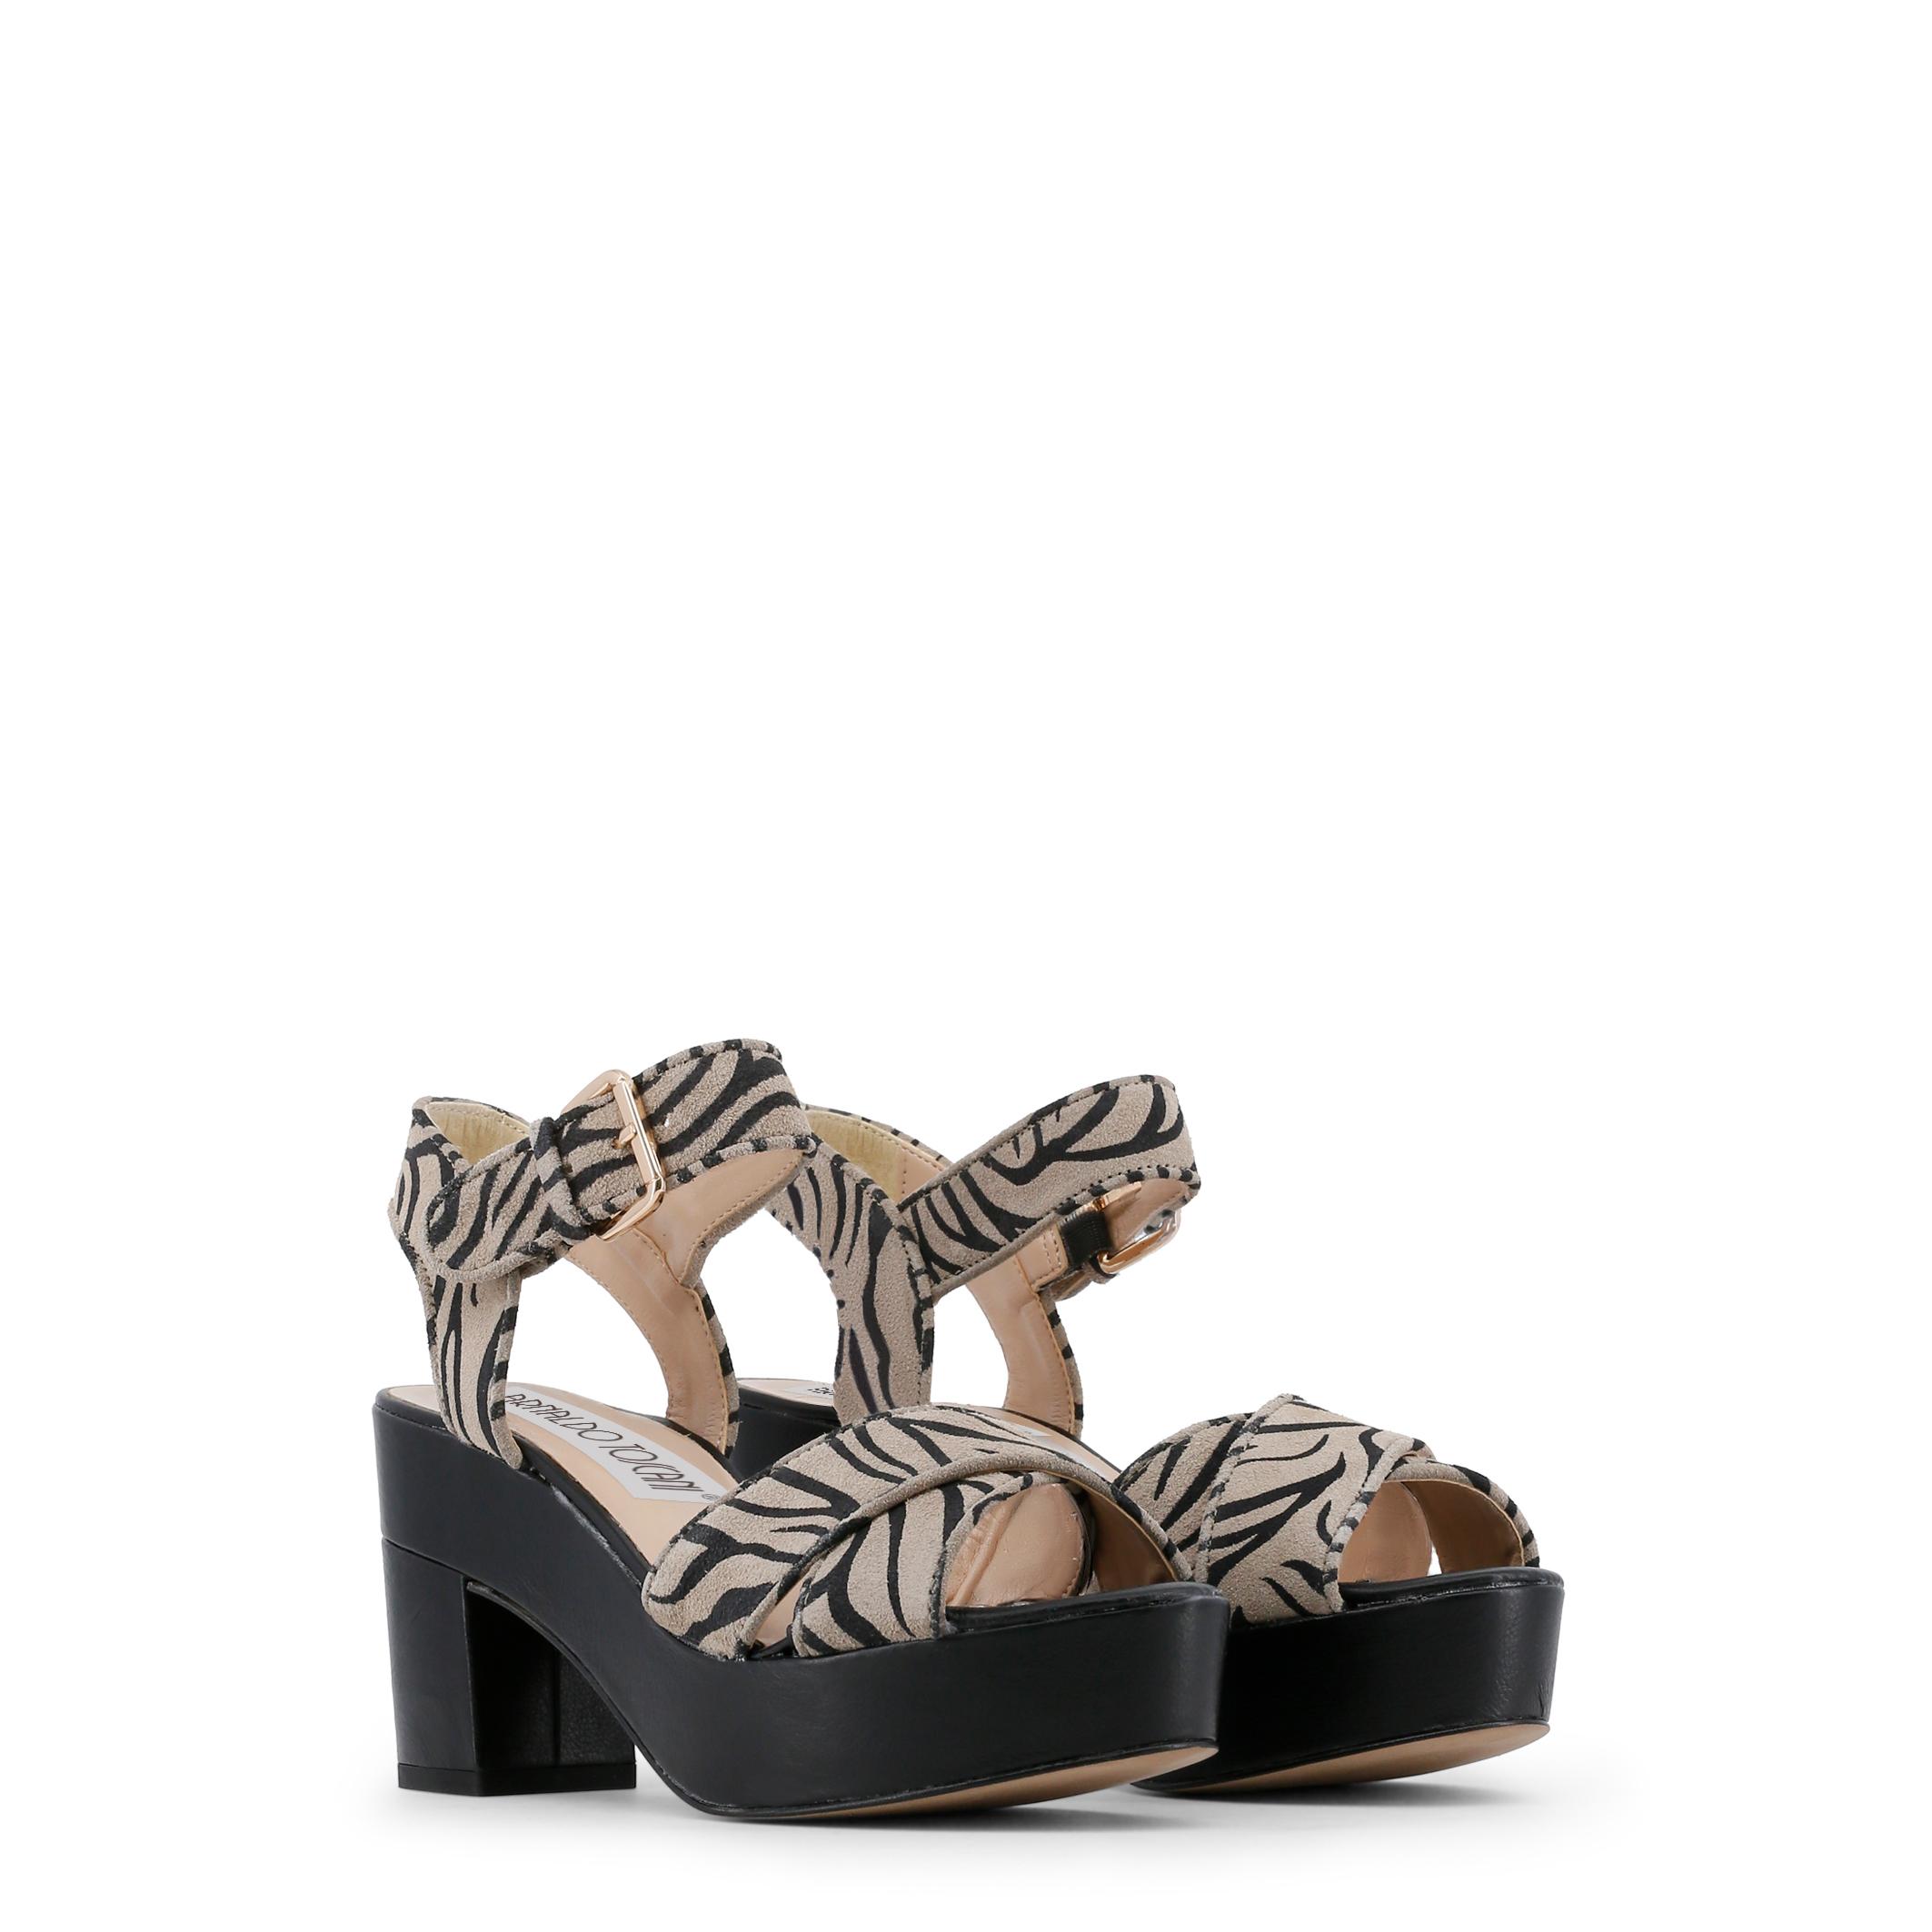 Arnaldo Toscani Schuhe 8074101, Damen Sandaleette Schwarz/Schwarz/Grau Frühling/S